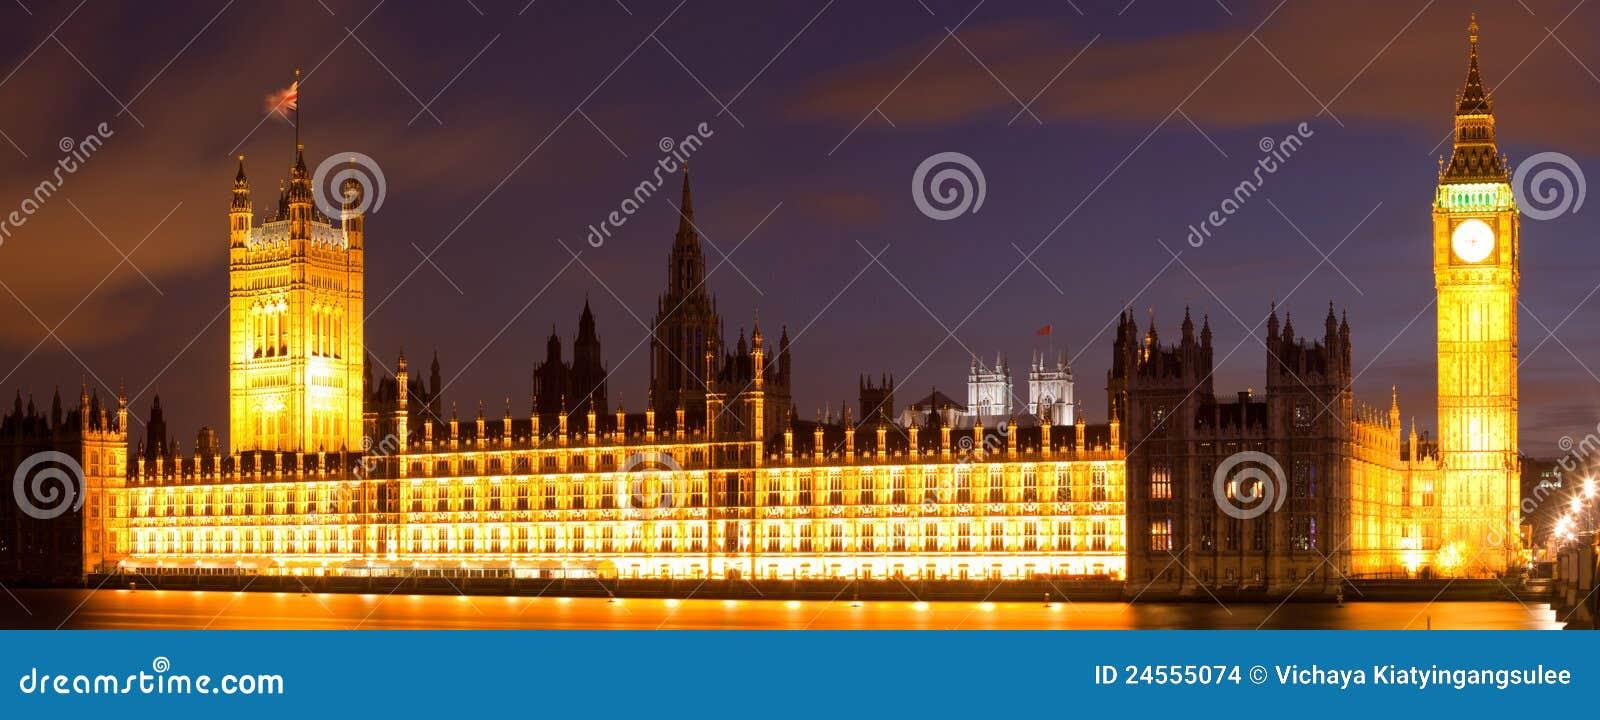 Big Ben London Panorama